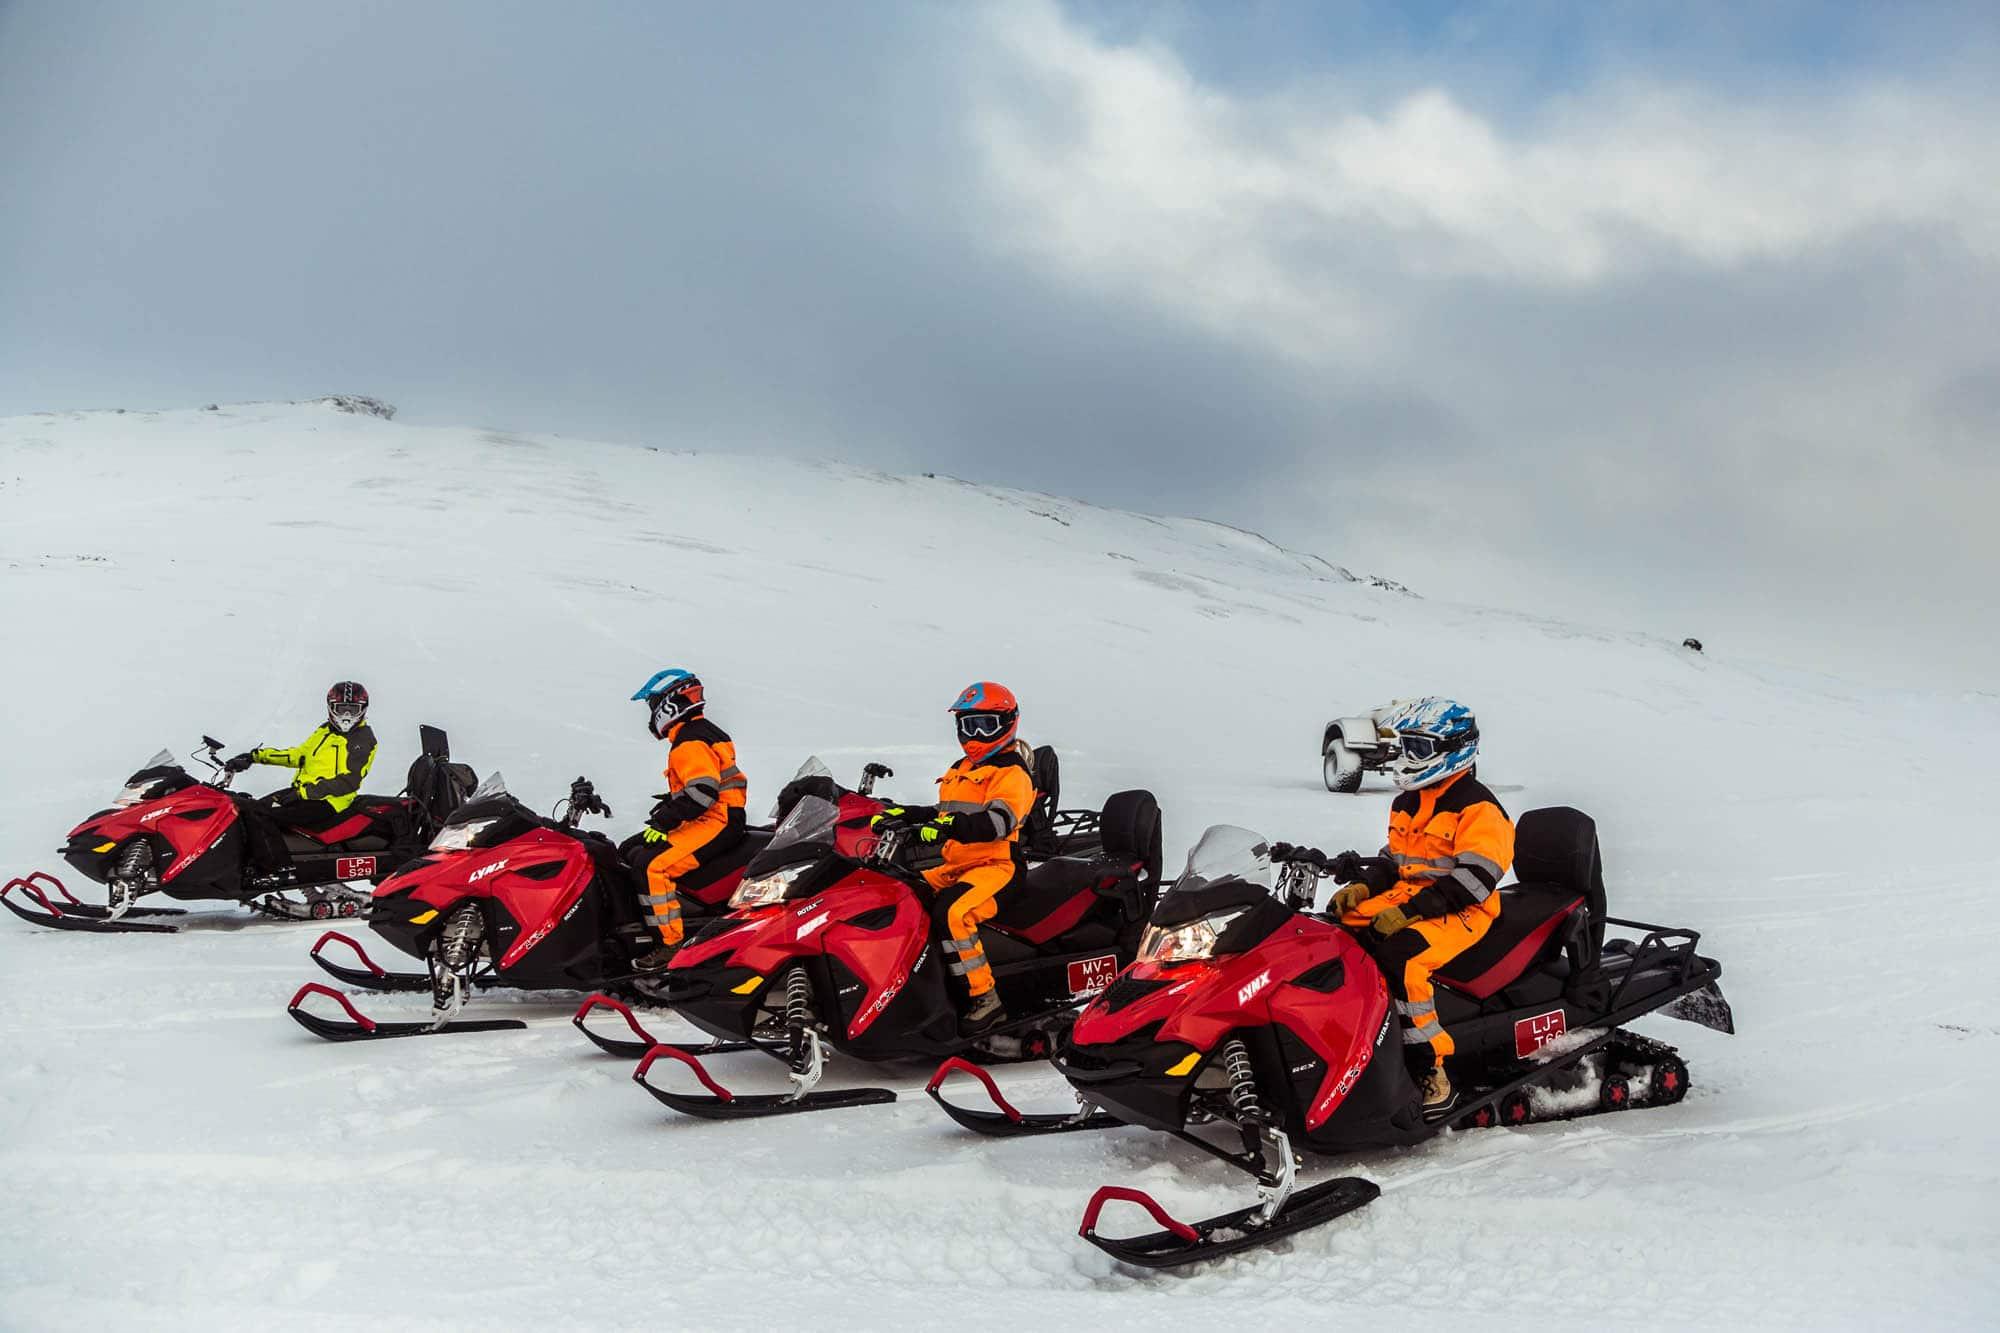 iceland snowmobiling tour langjokull glacier iceland